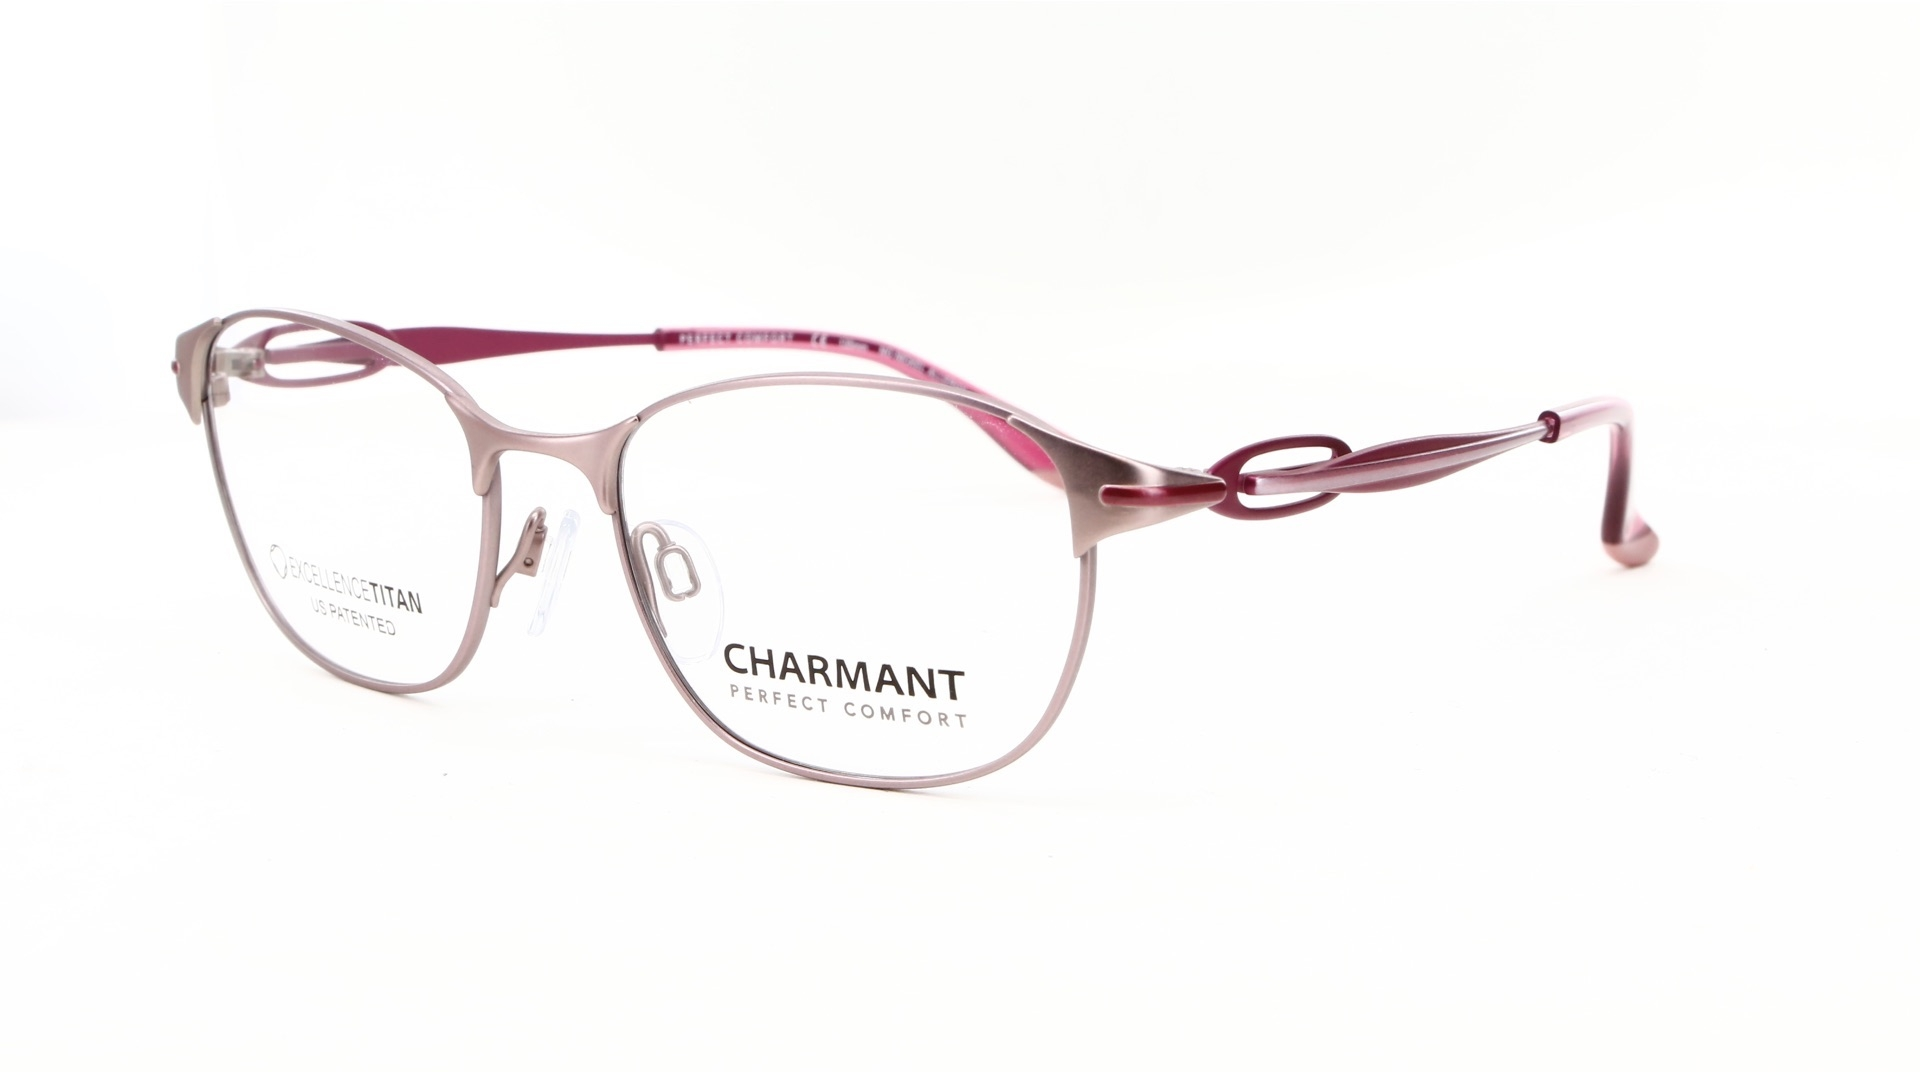 Charmant - ref: 78996